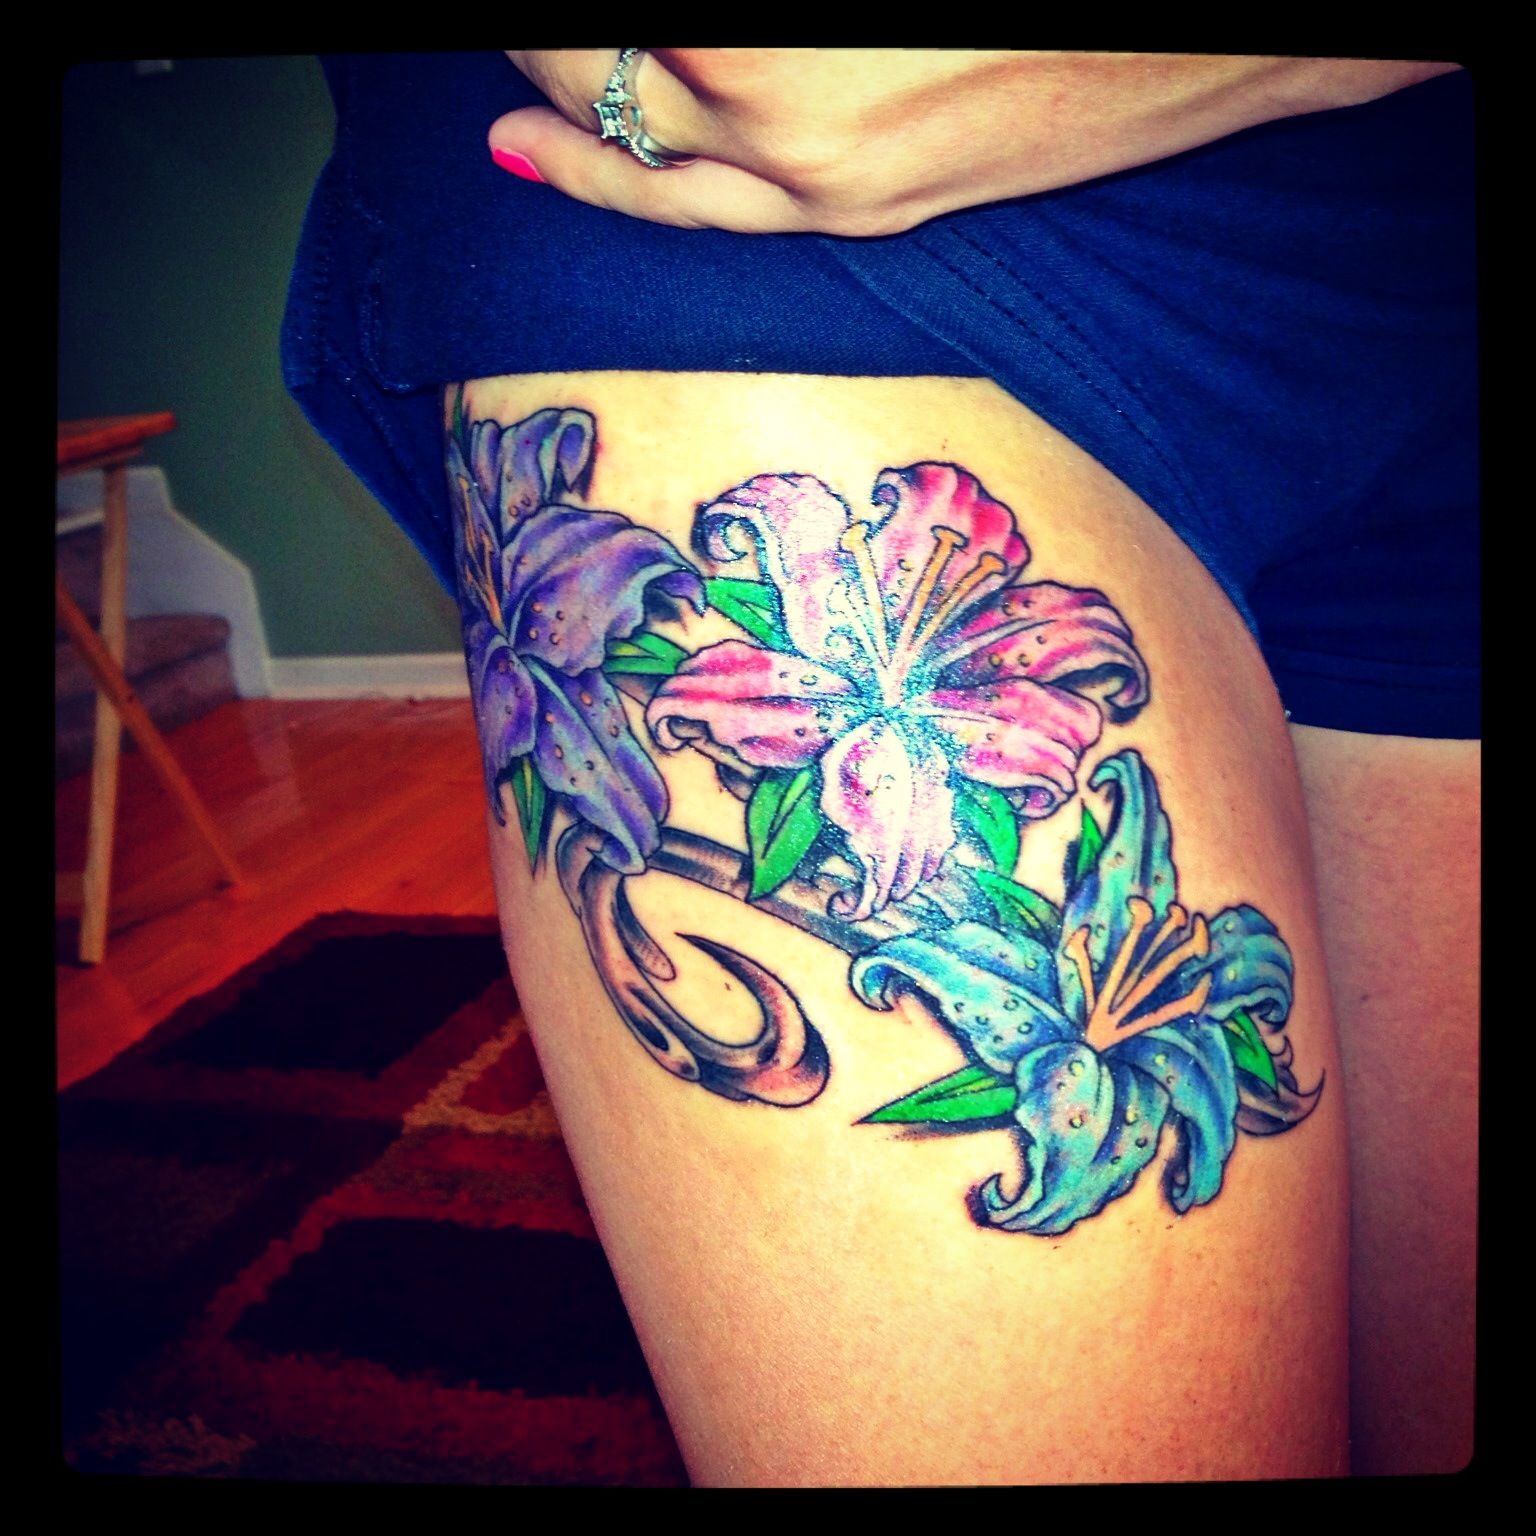 Flower thigh tattoo tattoo wish list pinterest flower thigh